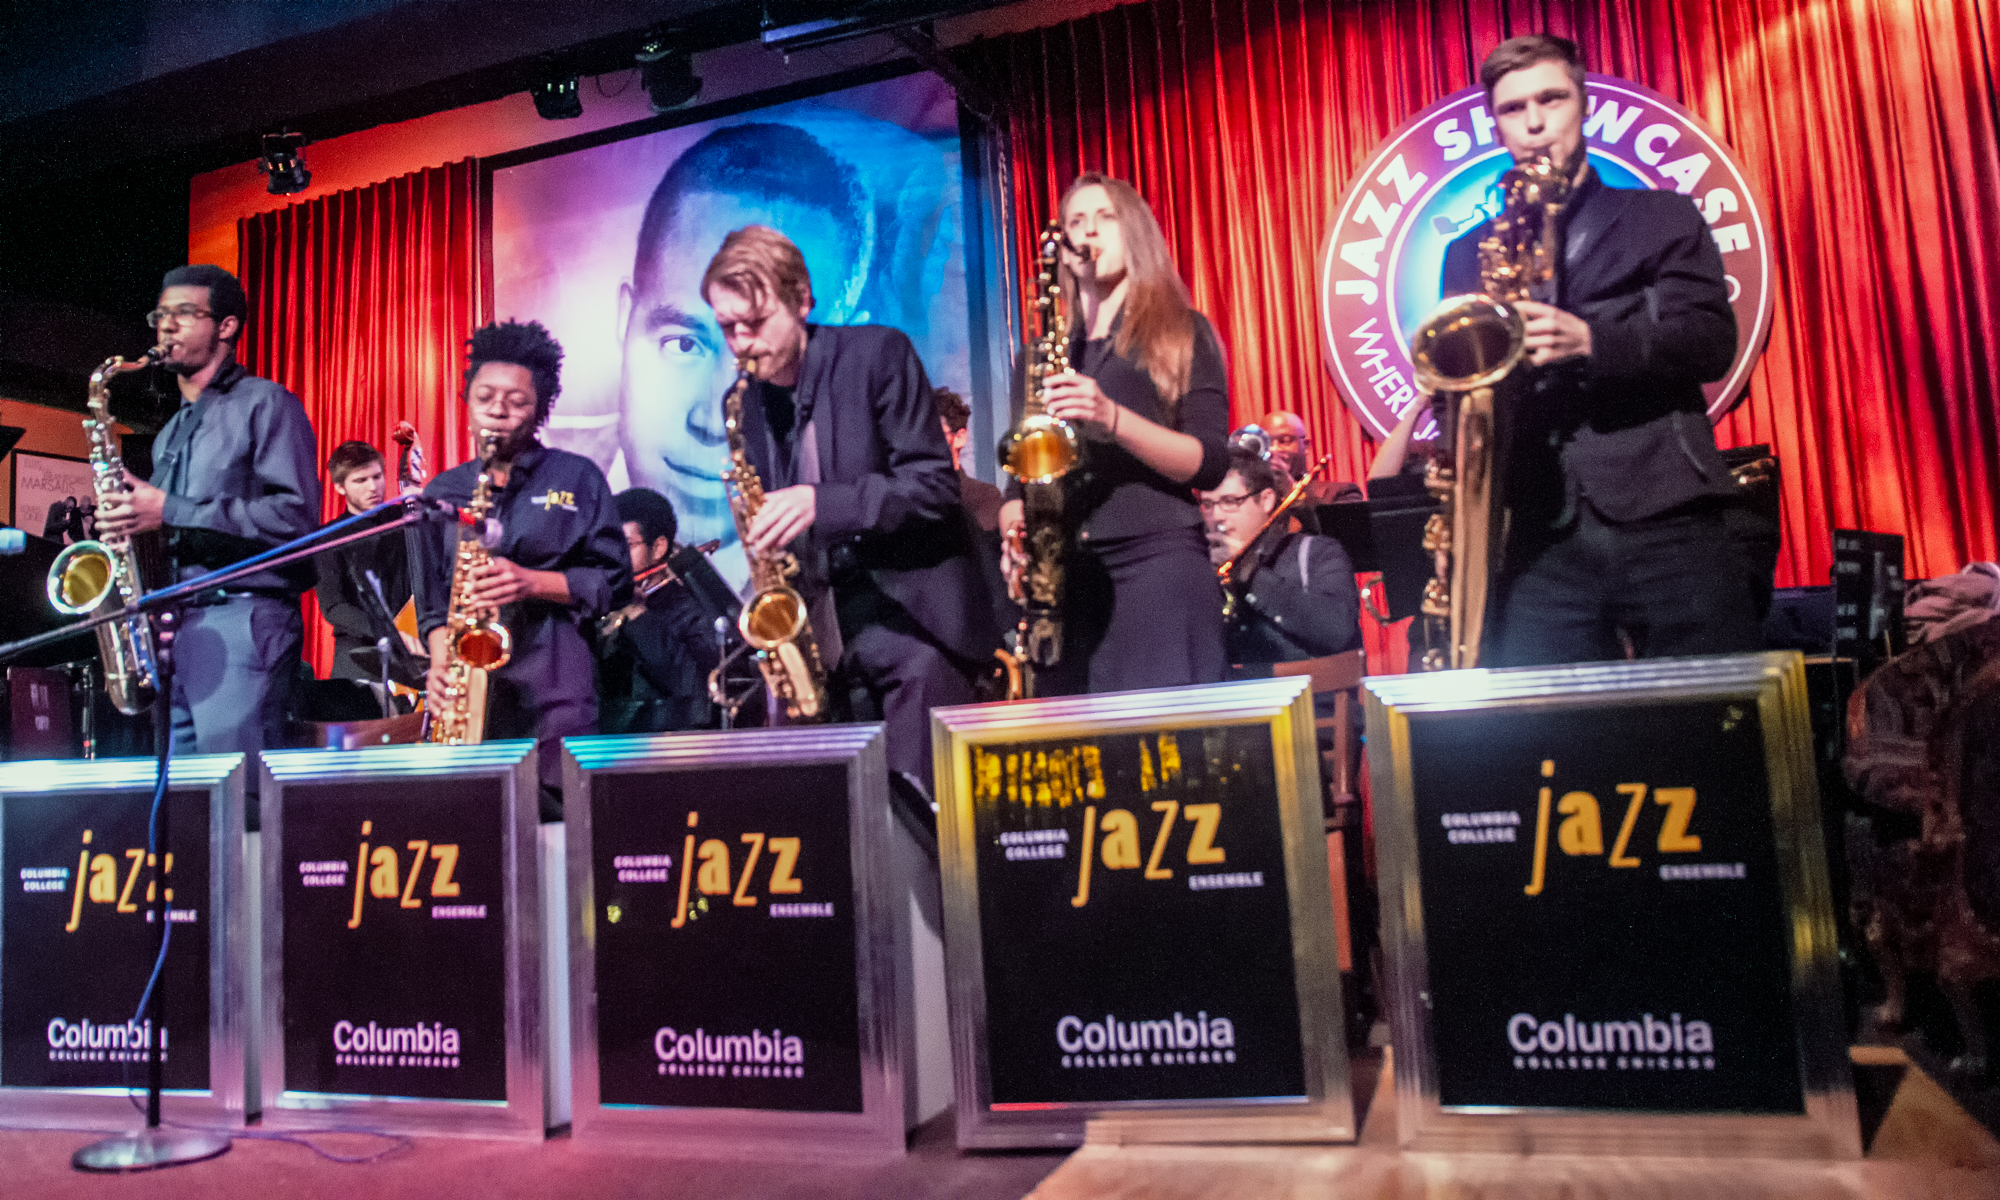 John Kelsie, Aisha Clark, Karolina Prus and Ian Buschman with Wycliffe Gordon and the Columbia College Jazz Ensemble at the Jazz Showcase in Chicago